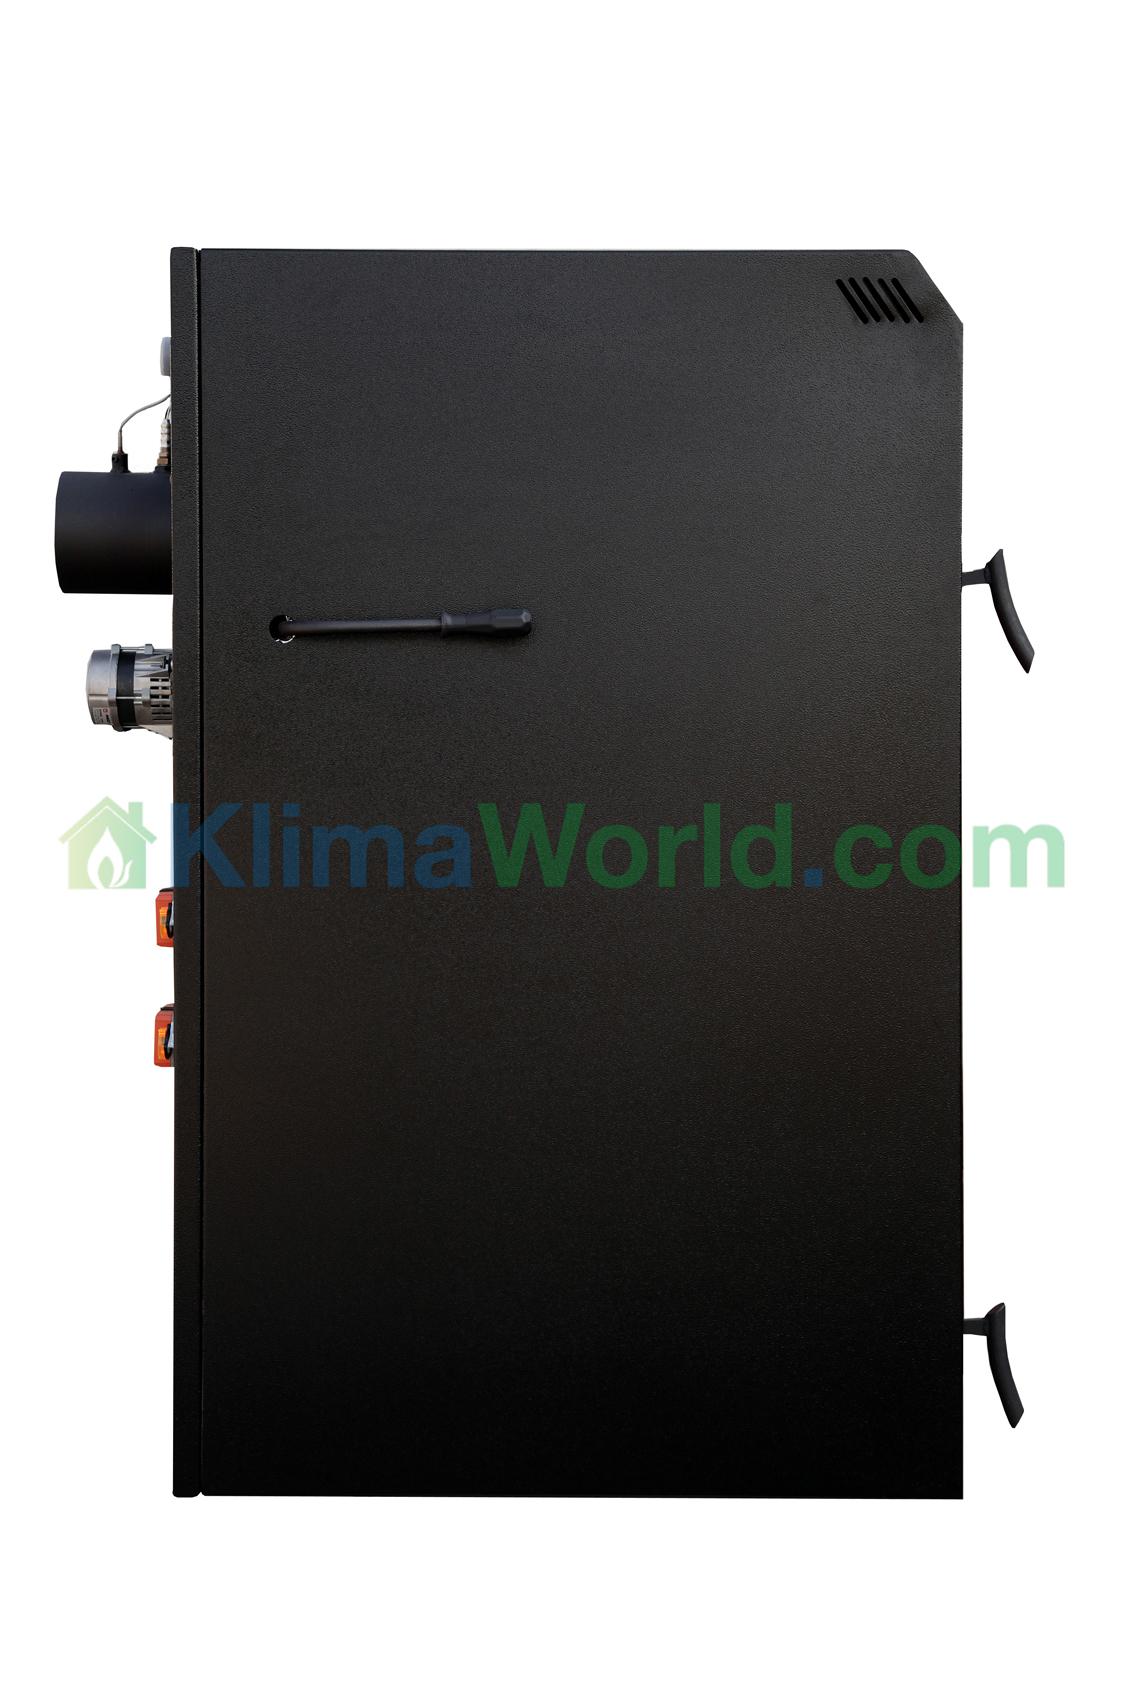 holzvergaser thermoflux pid logic lambda vergaserkessel mit 30 kw bafa f rderbar. Black Bedroom Furniture Sets. Home Design Ideas